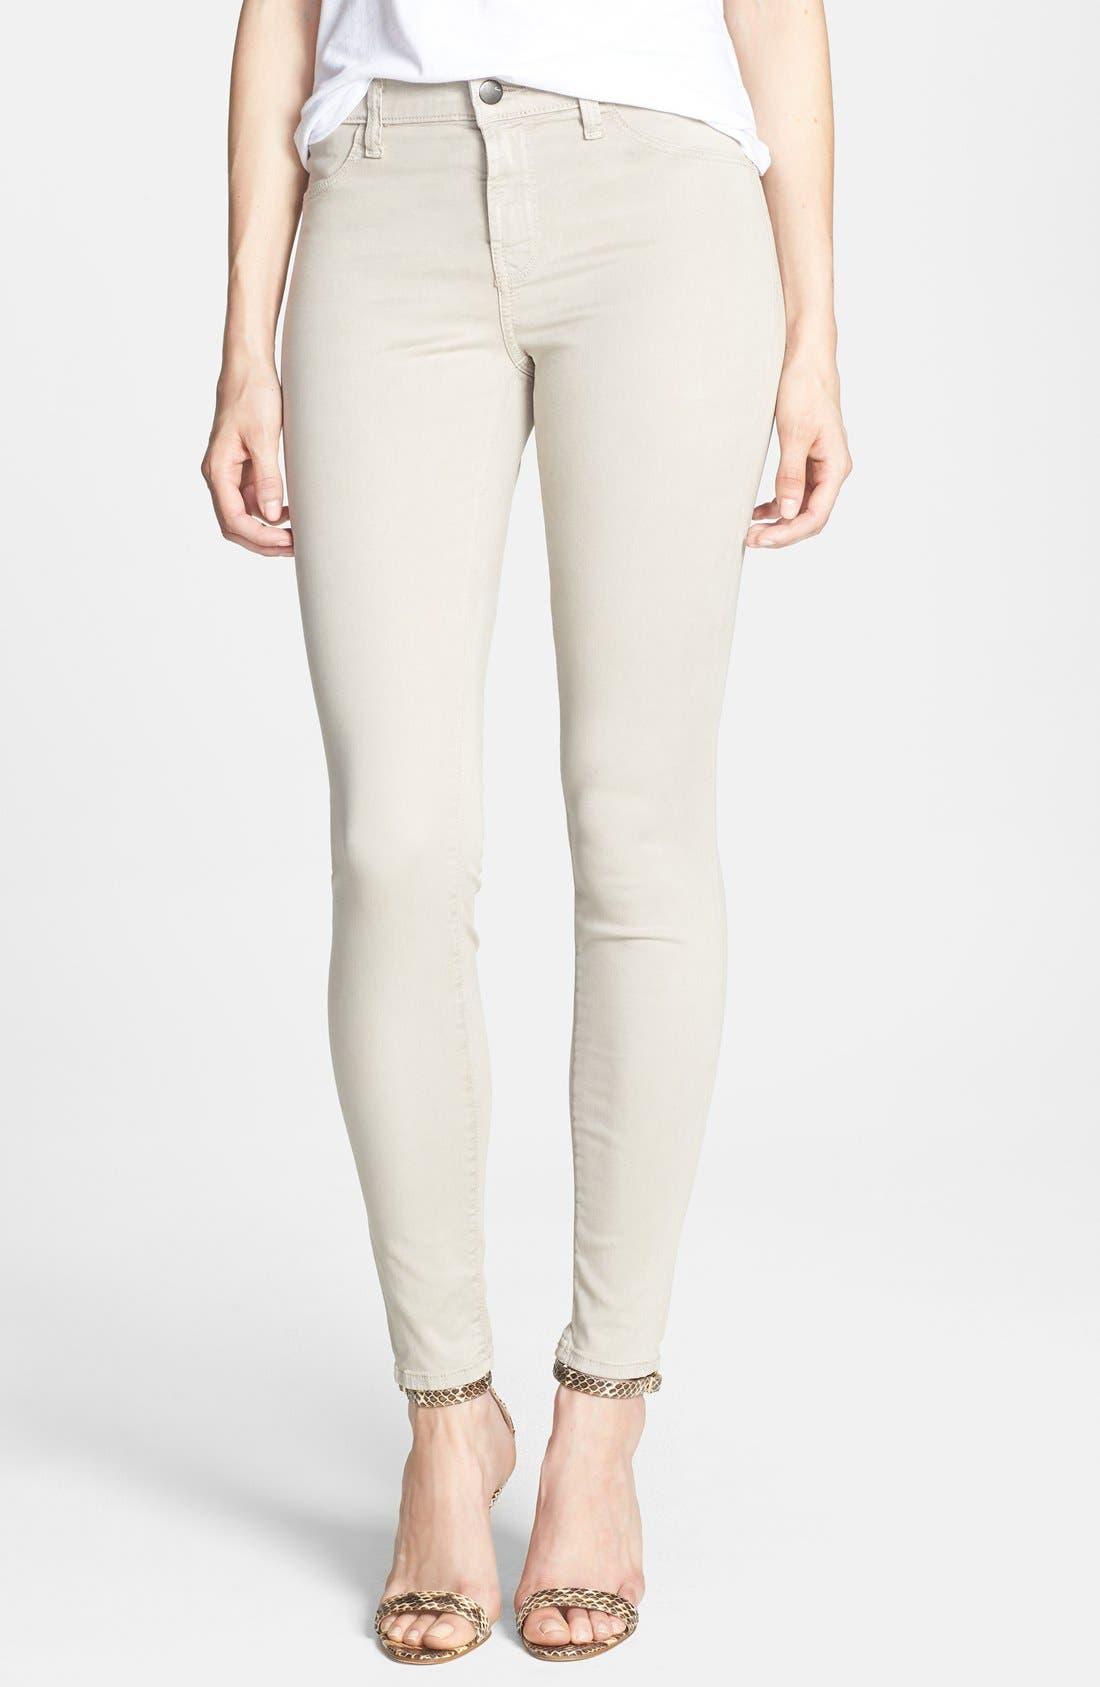 Alternate Image 1 Selected - J Brand '485' Mid Rise Super Skinny Jeans (Stone)